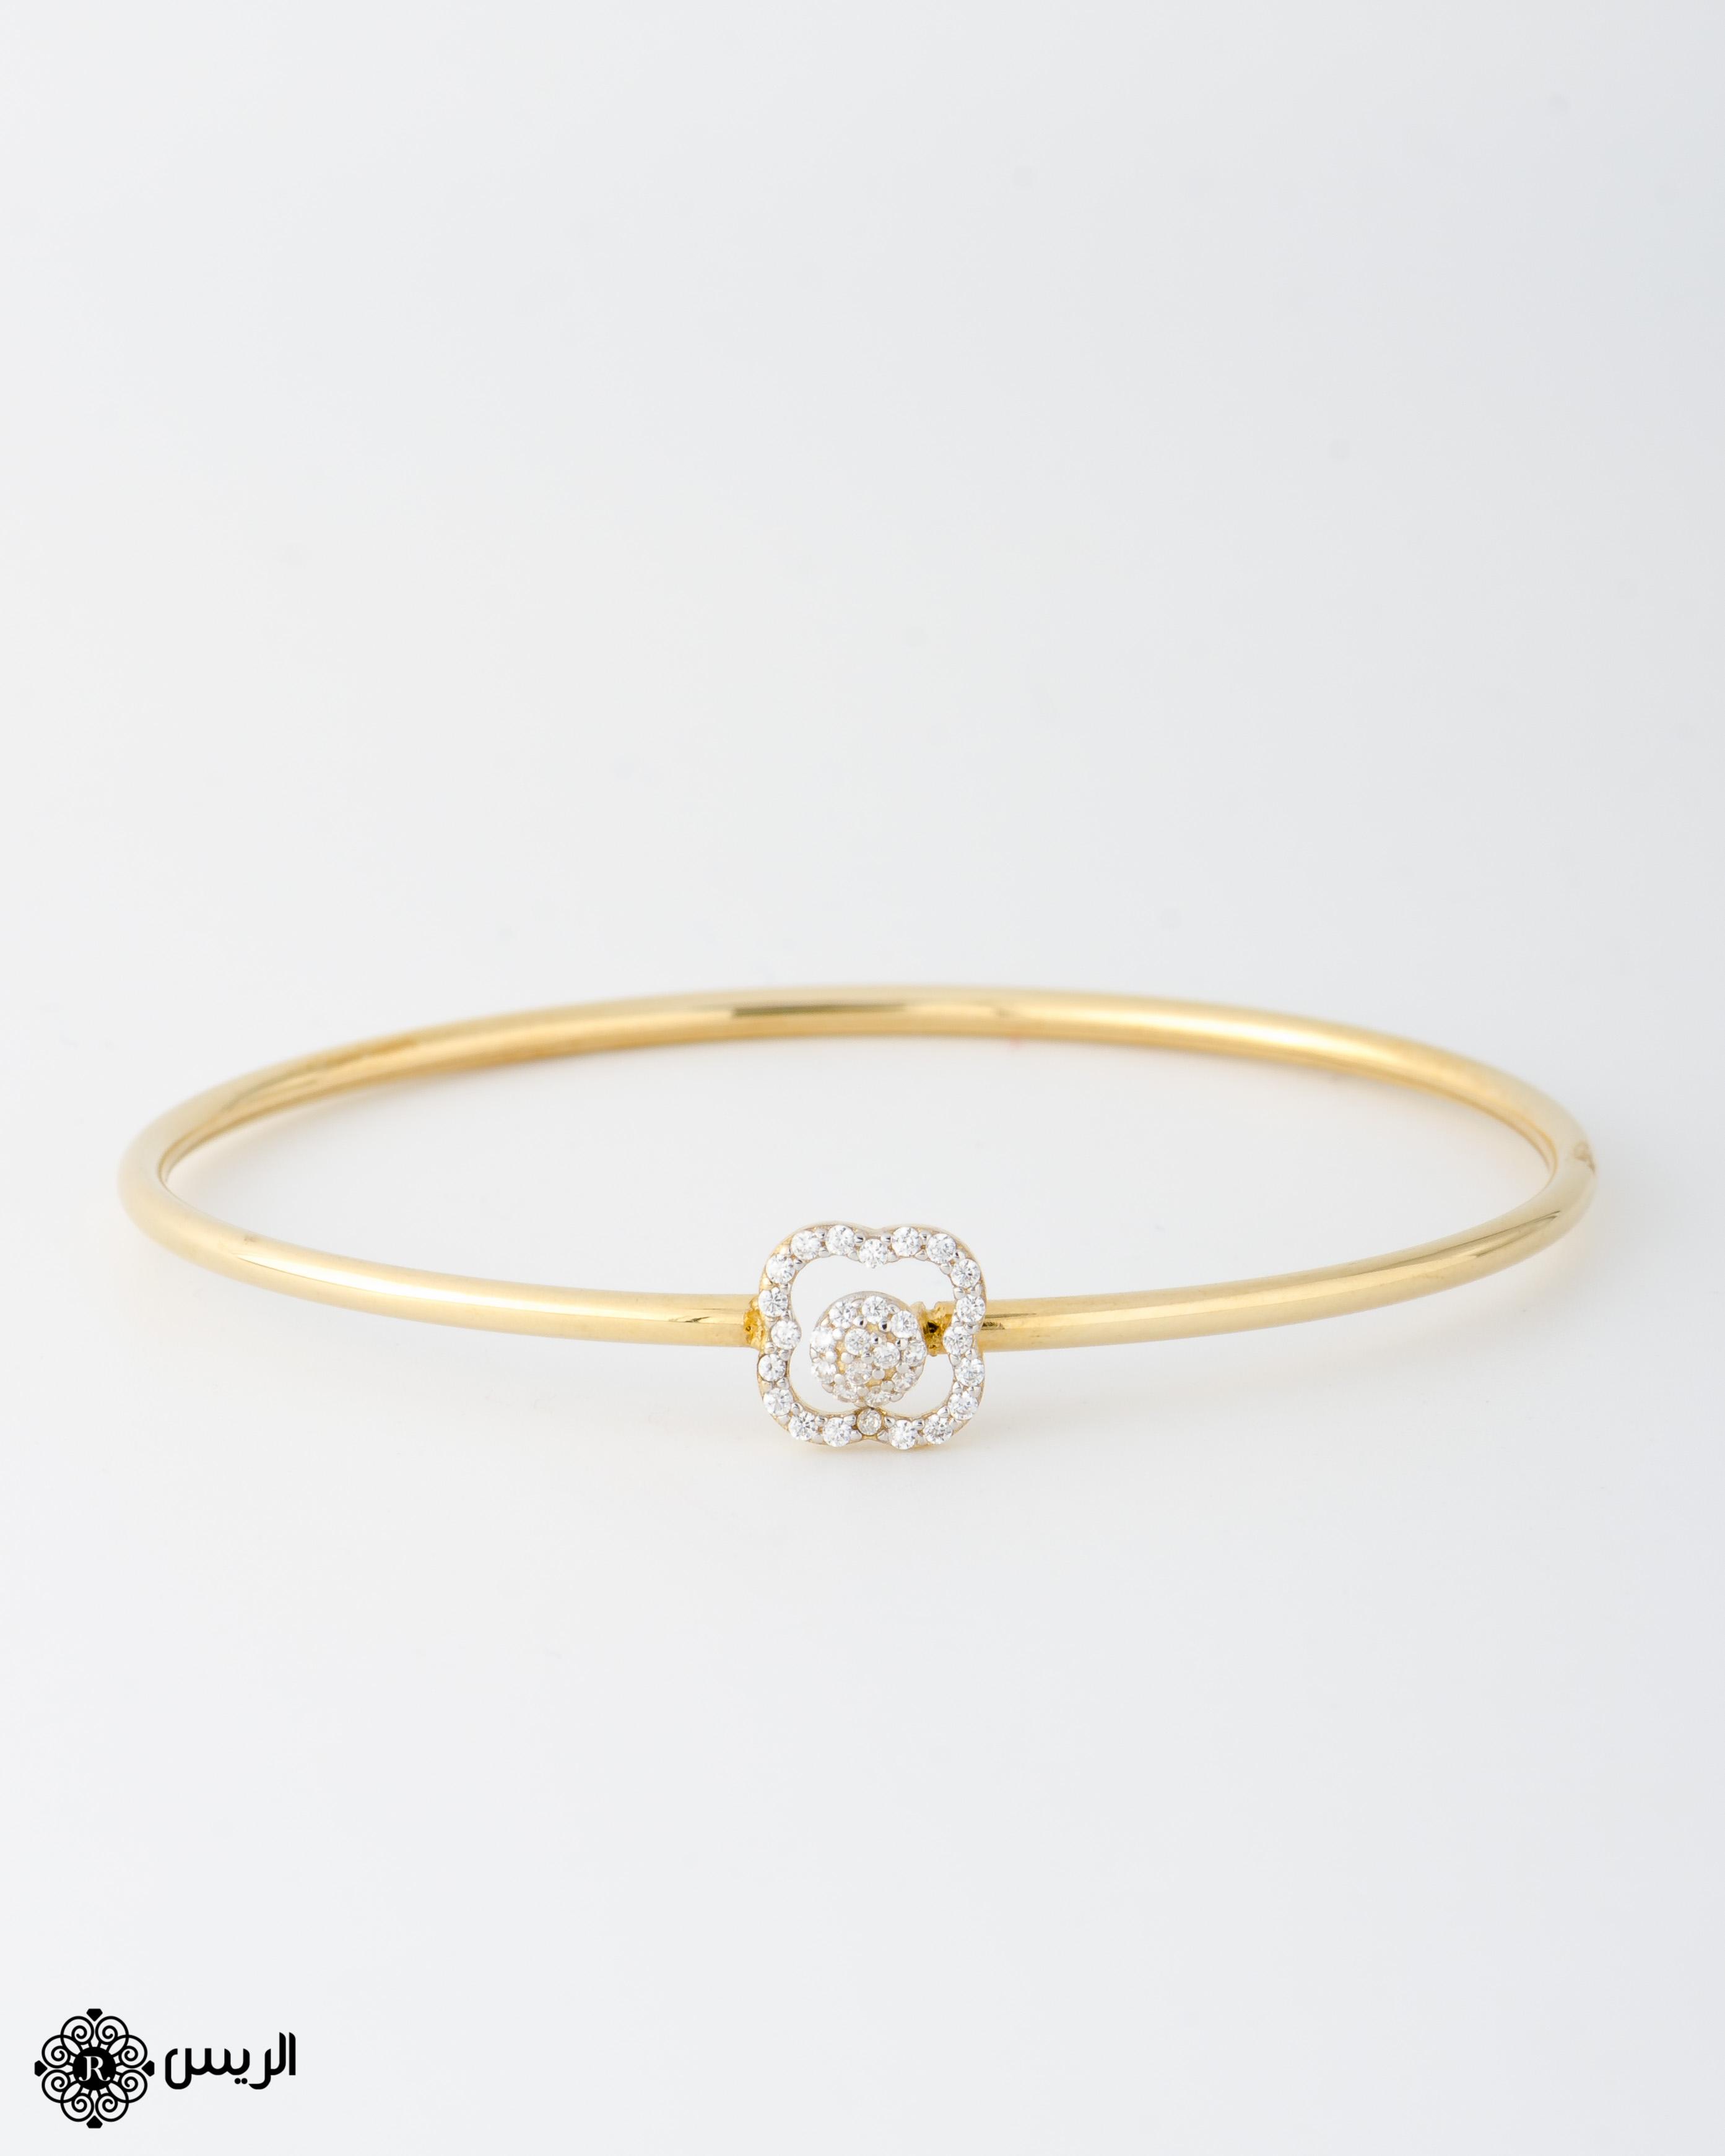 Raies jewelry Bangle Casual Design إسورة تصميم سبور الريس للمجوهرات